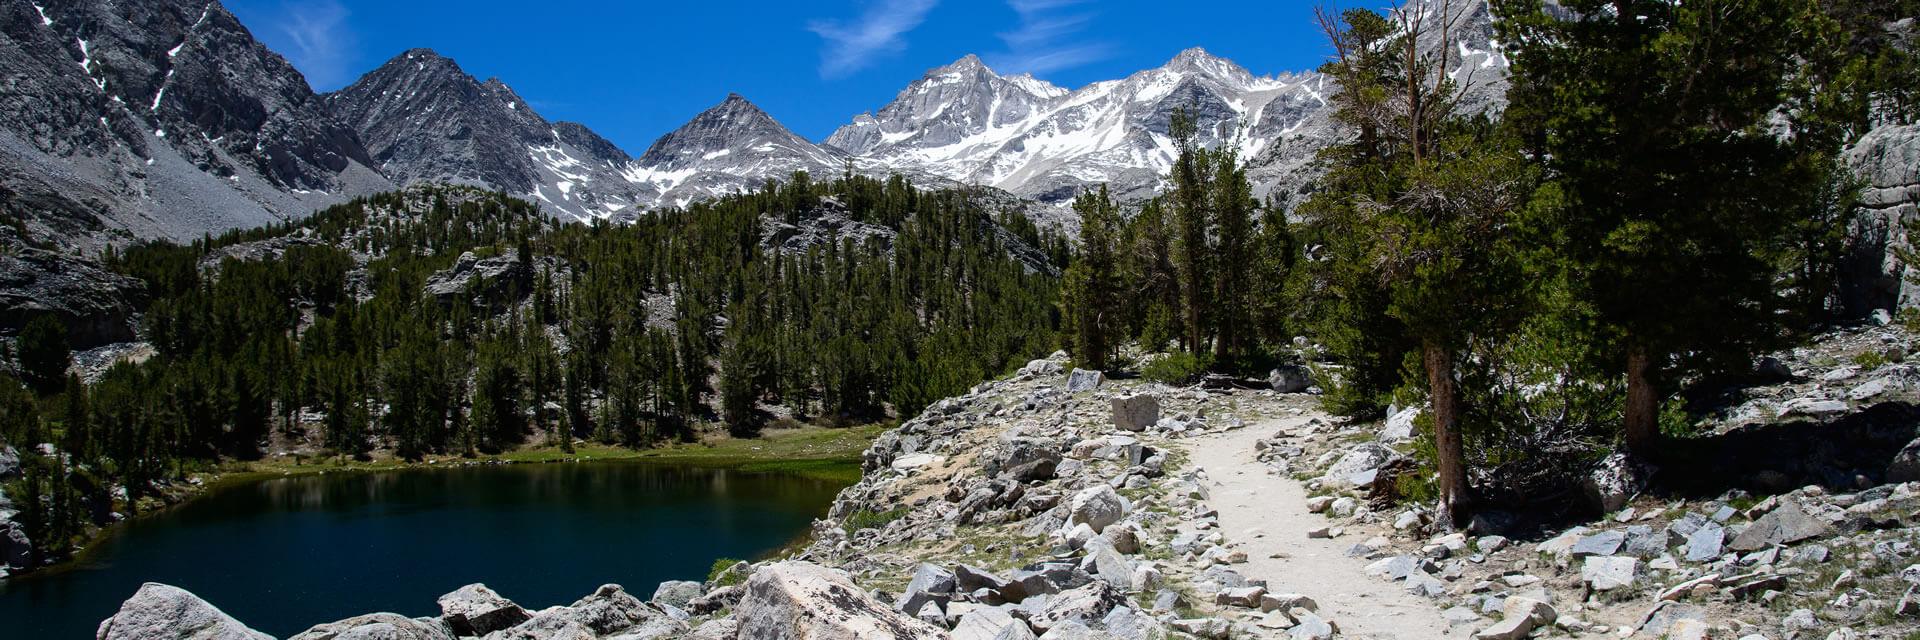 Rocky trail alongside a lake heading towards the Sierra Nevada mountains